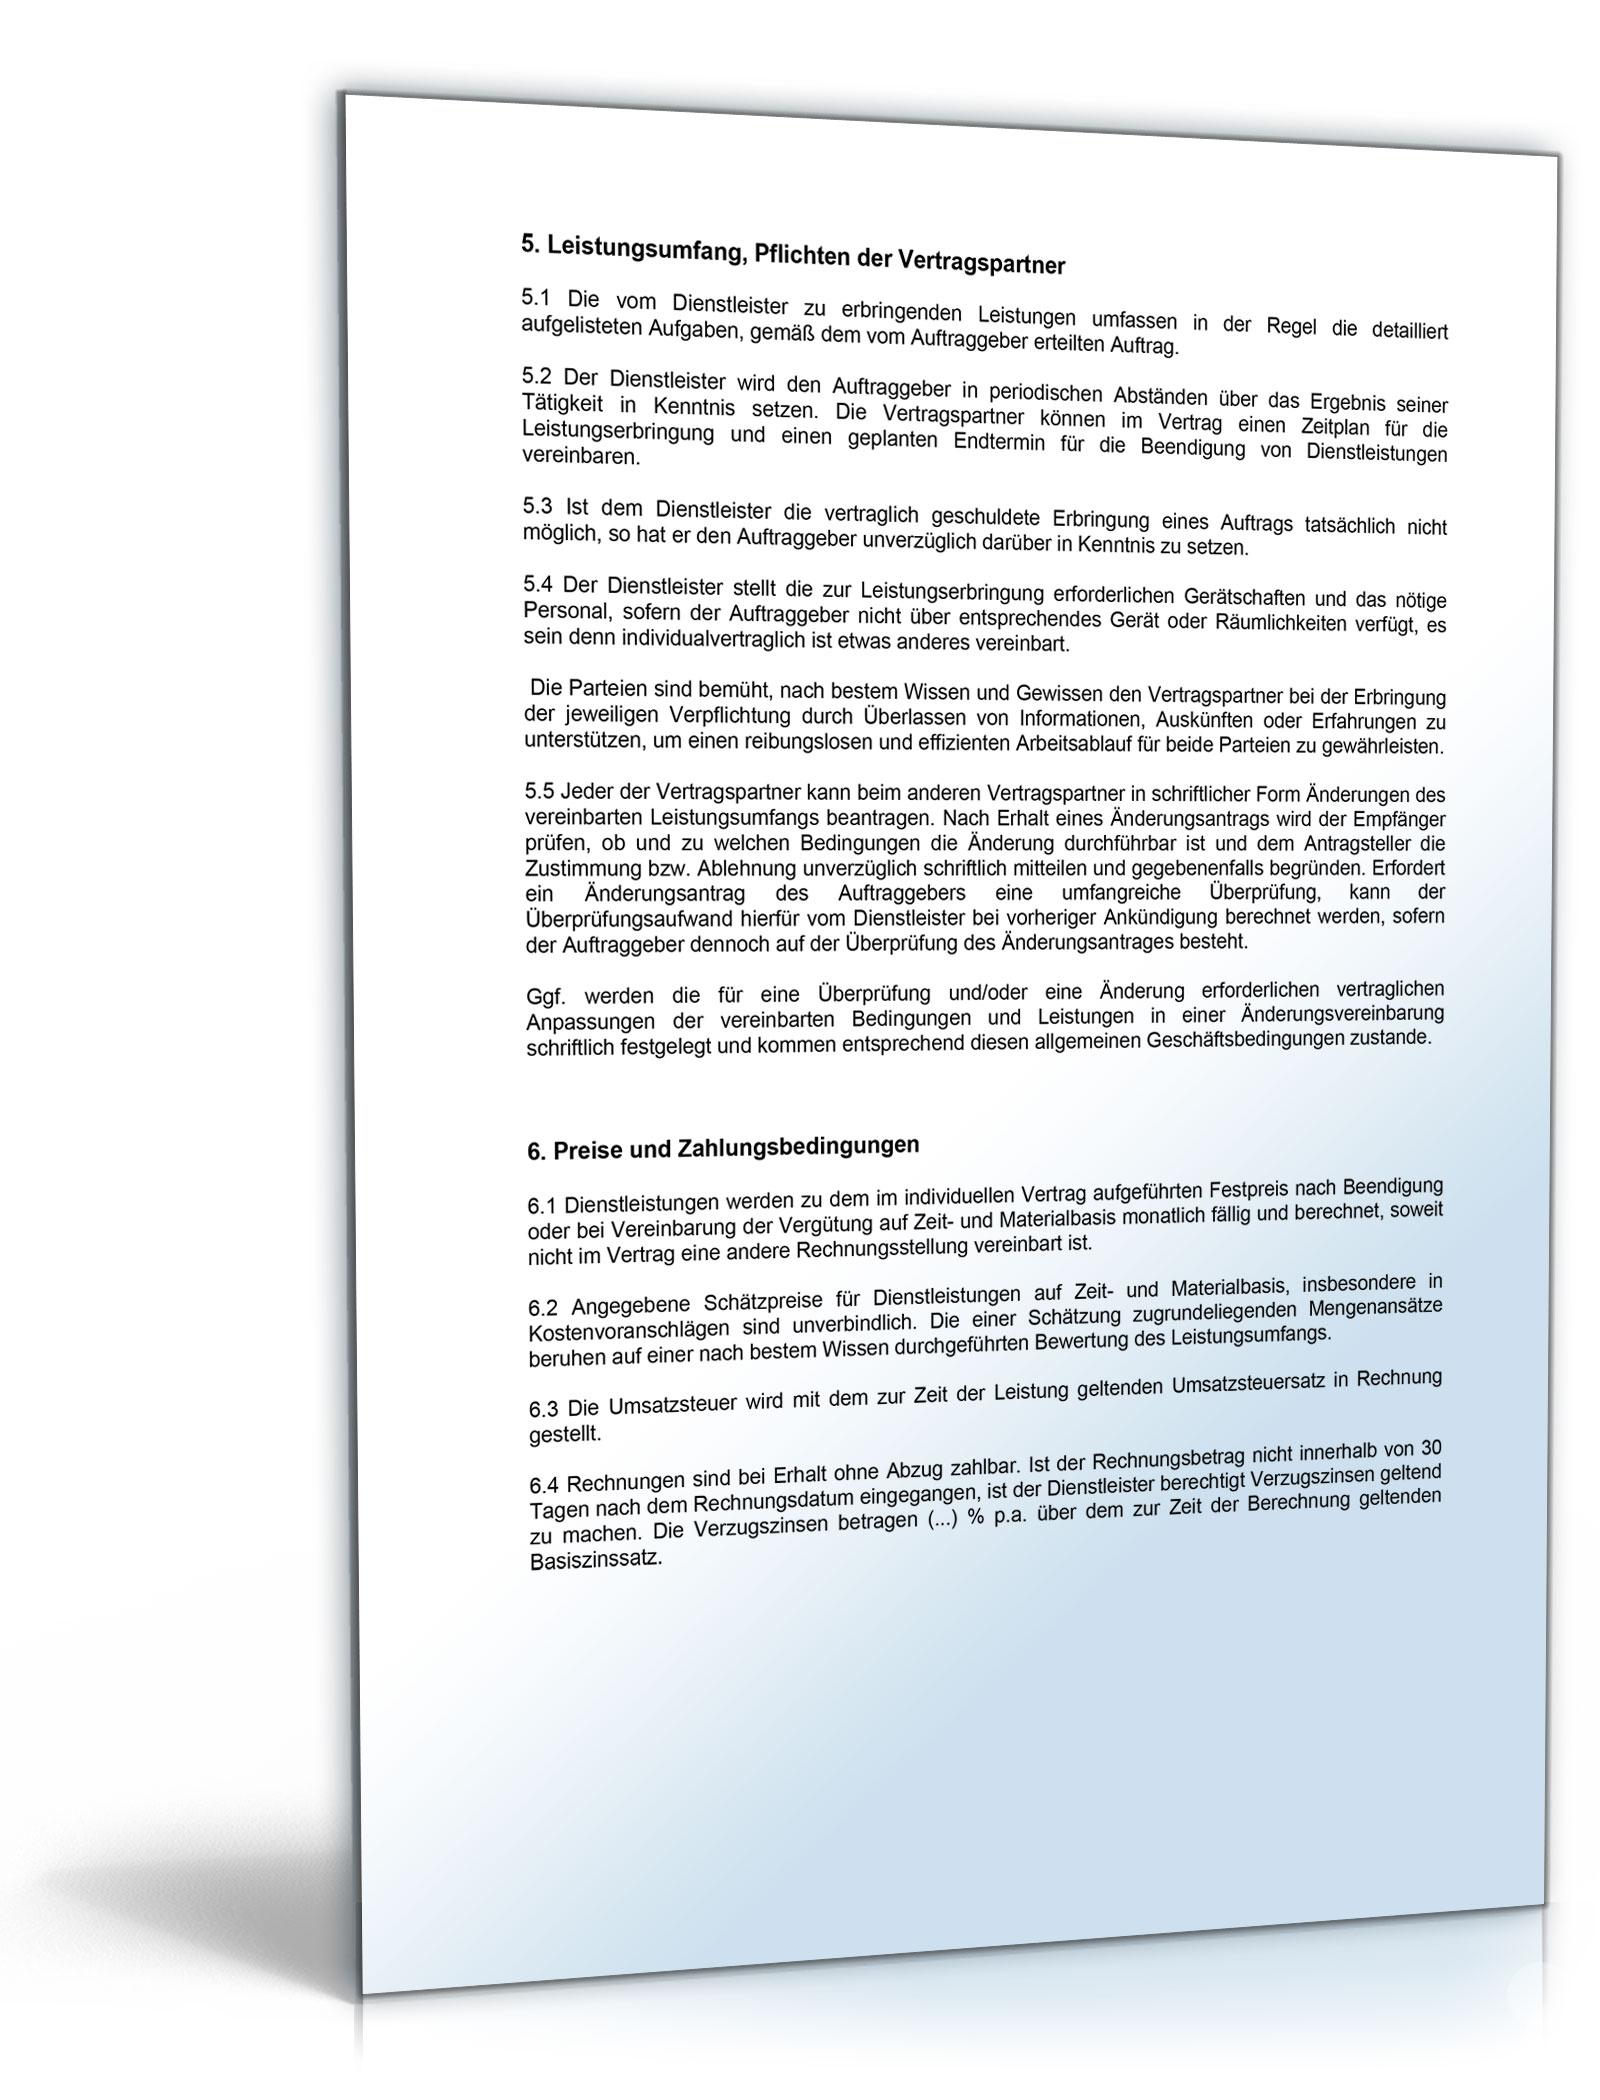 AGB Dienstleistungen [Word Dokument]: Amazon.de: Software